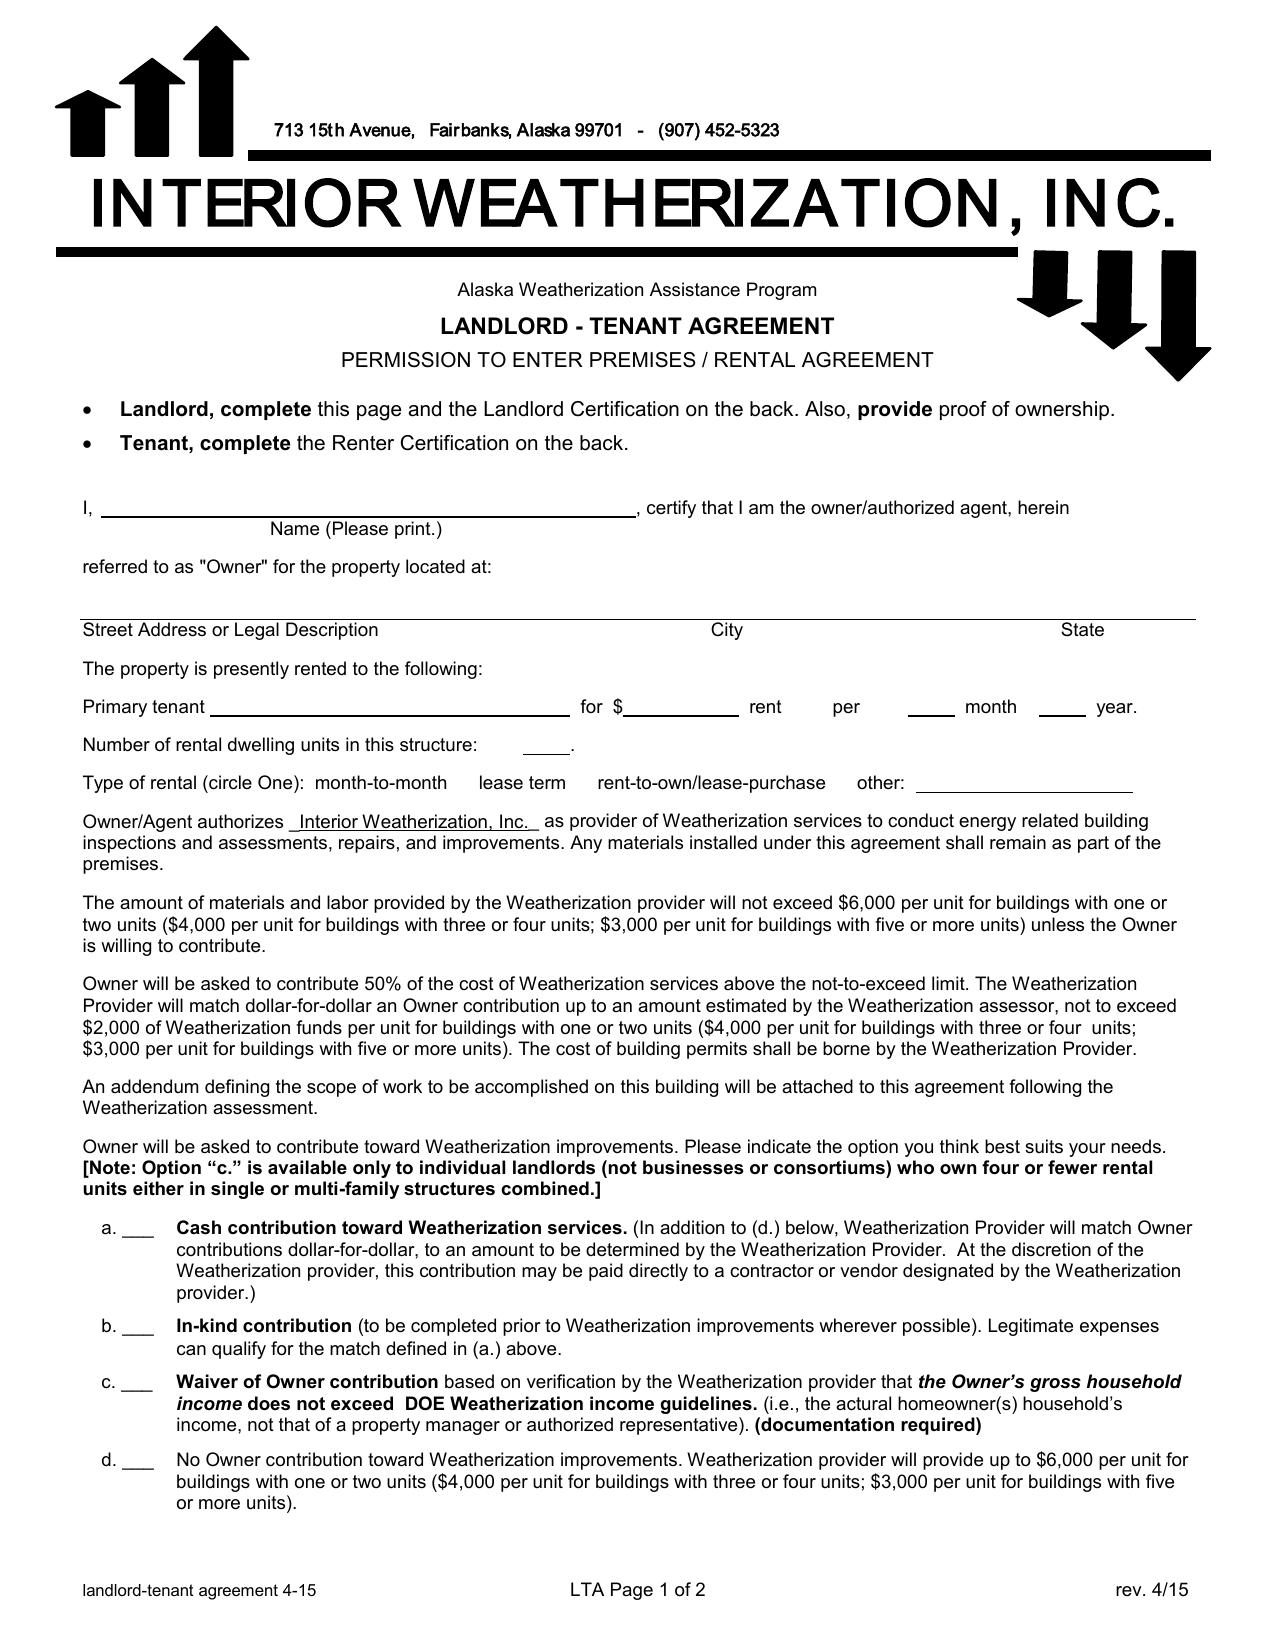 Landlord Tenant Agreement Interior Weatherization Inc